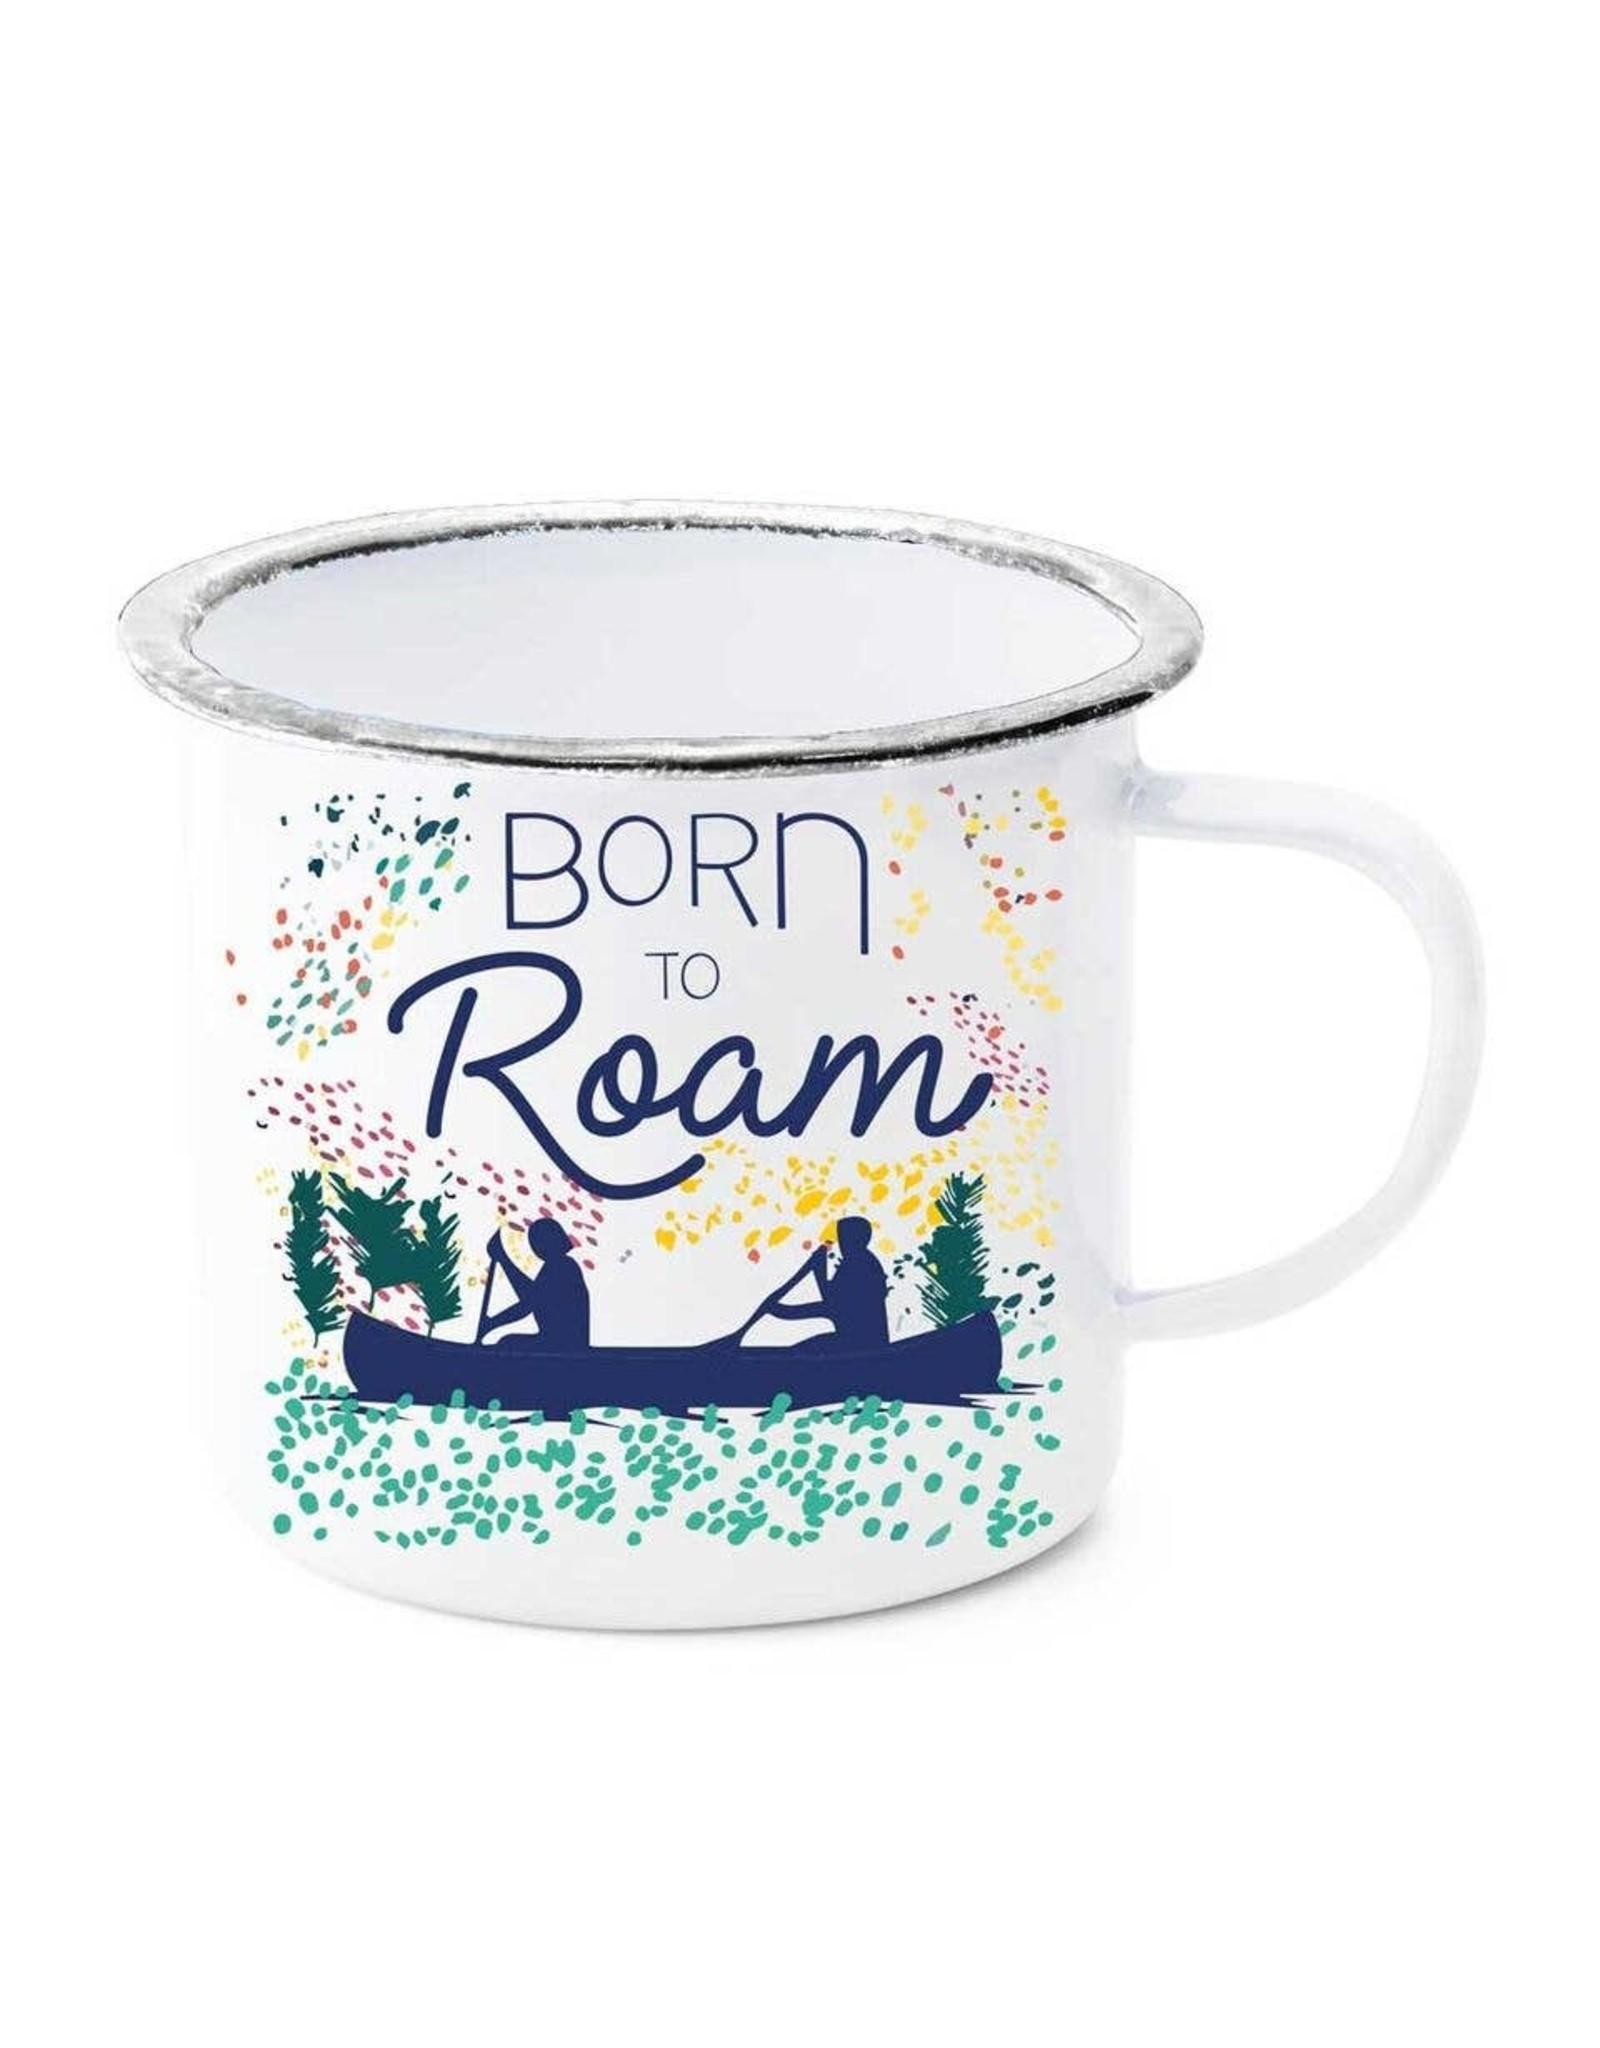 Born to Roam Canoe Enamel Mug